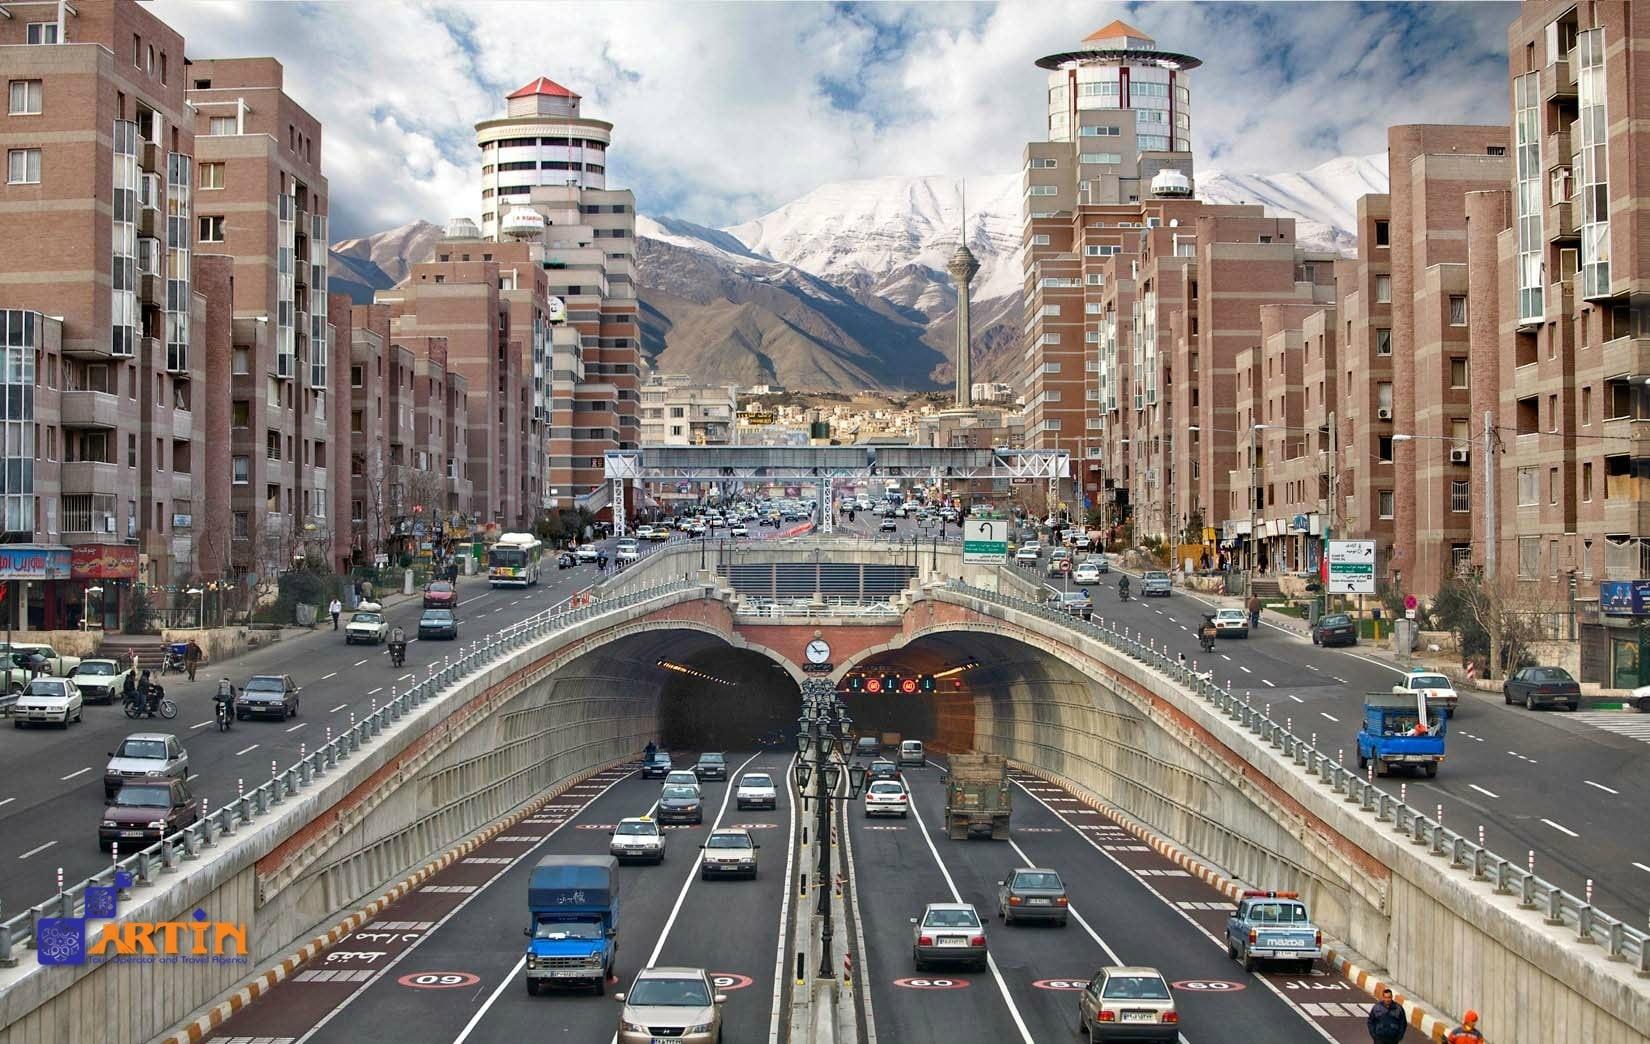 Iran roads safety and driving in Iran travelartin.com